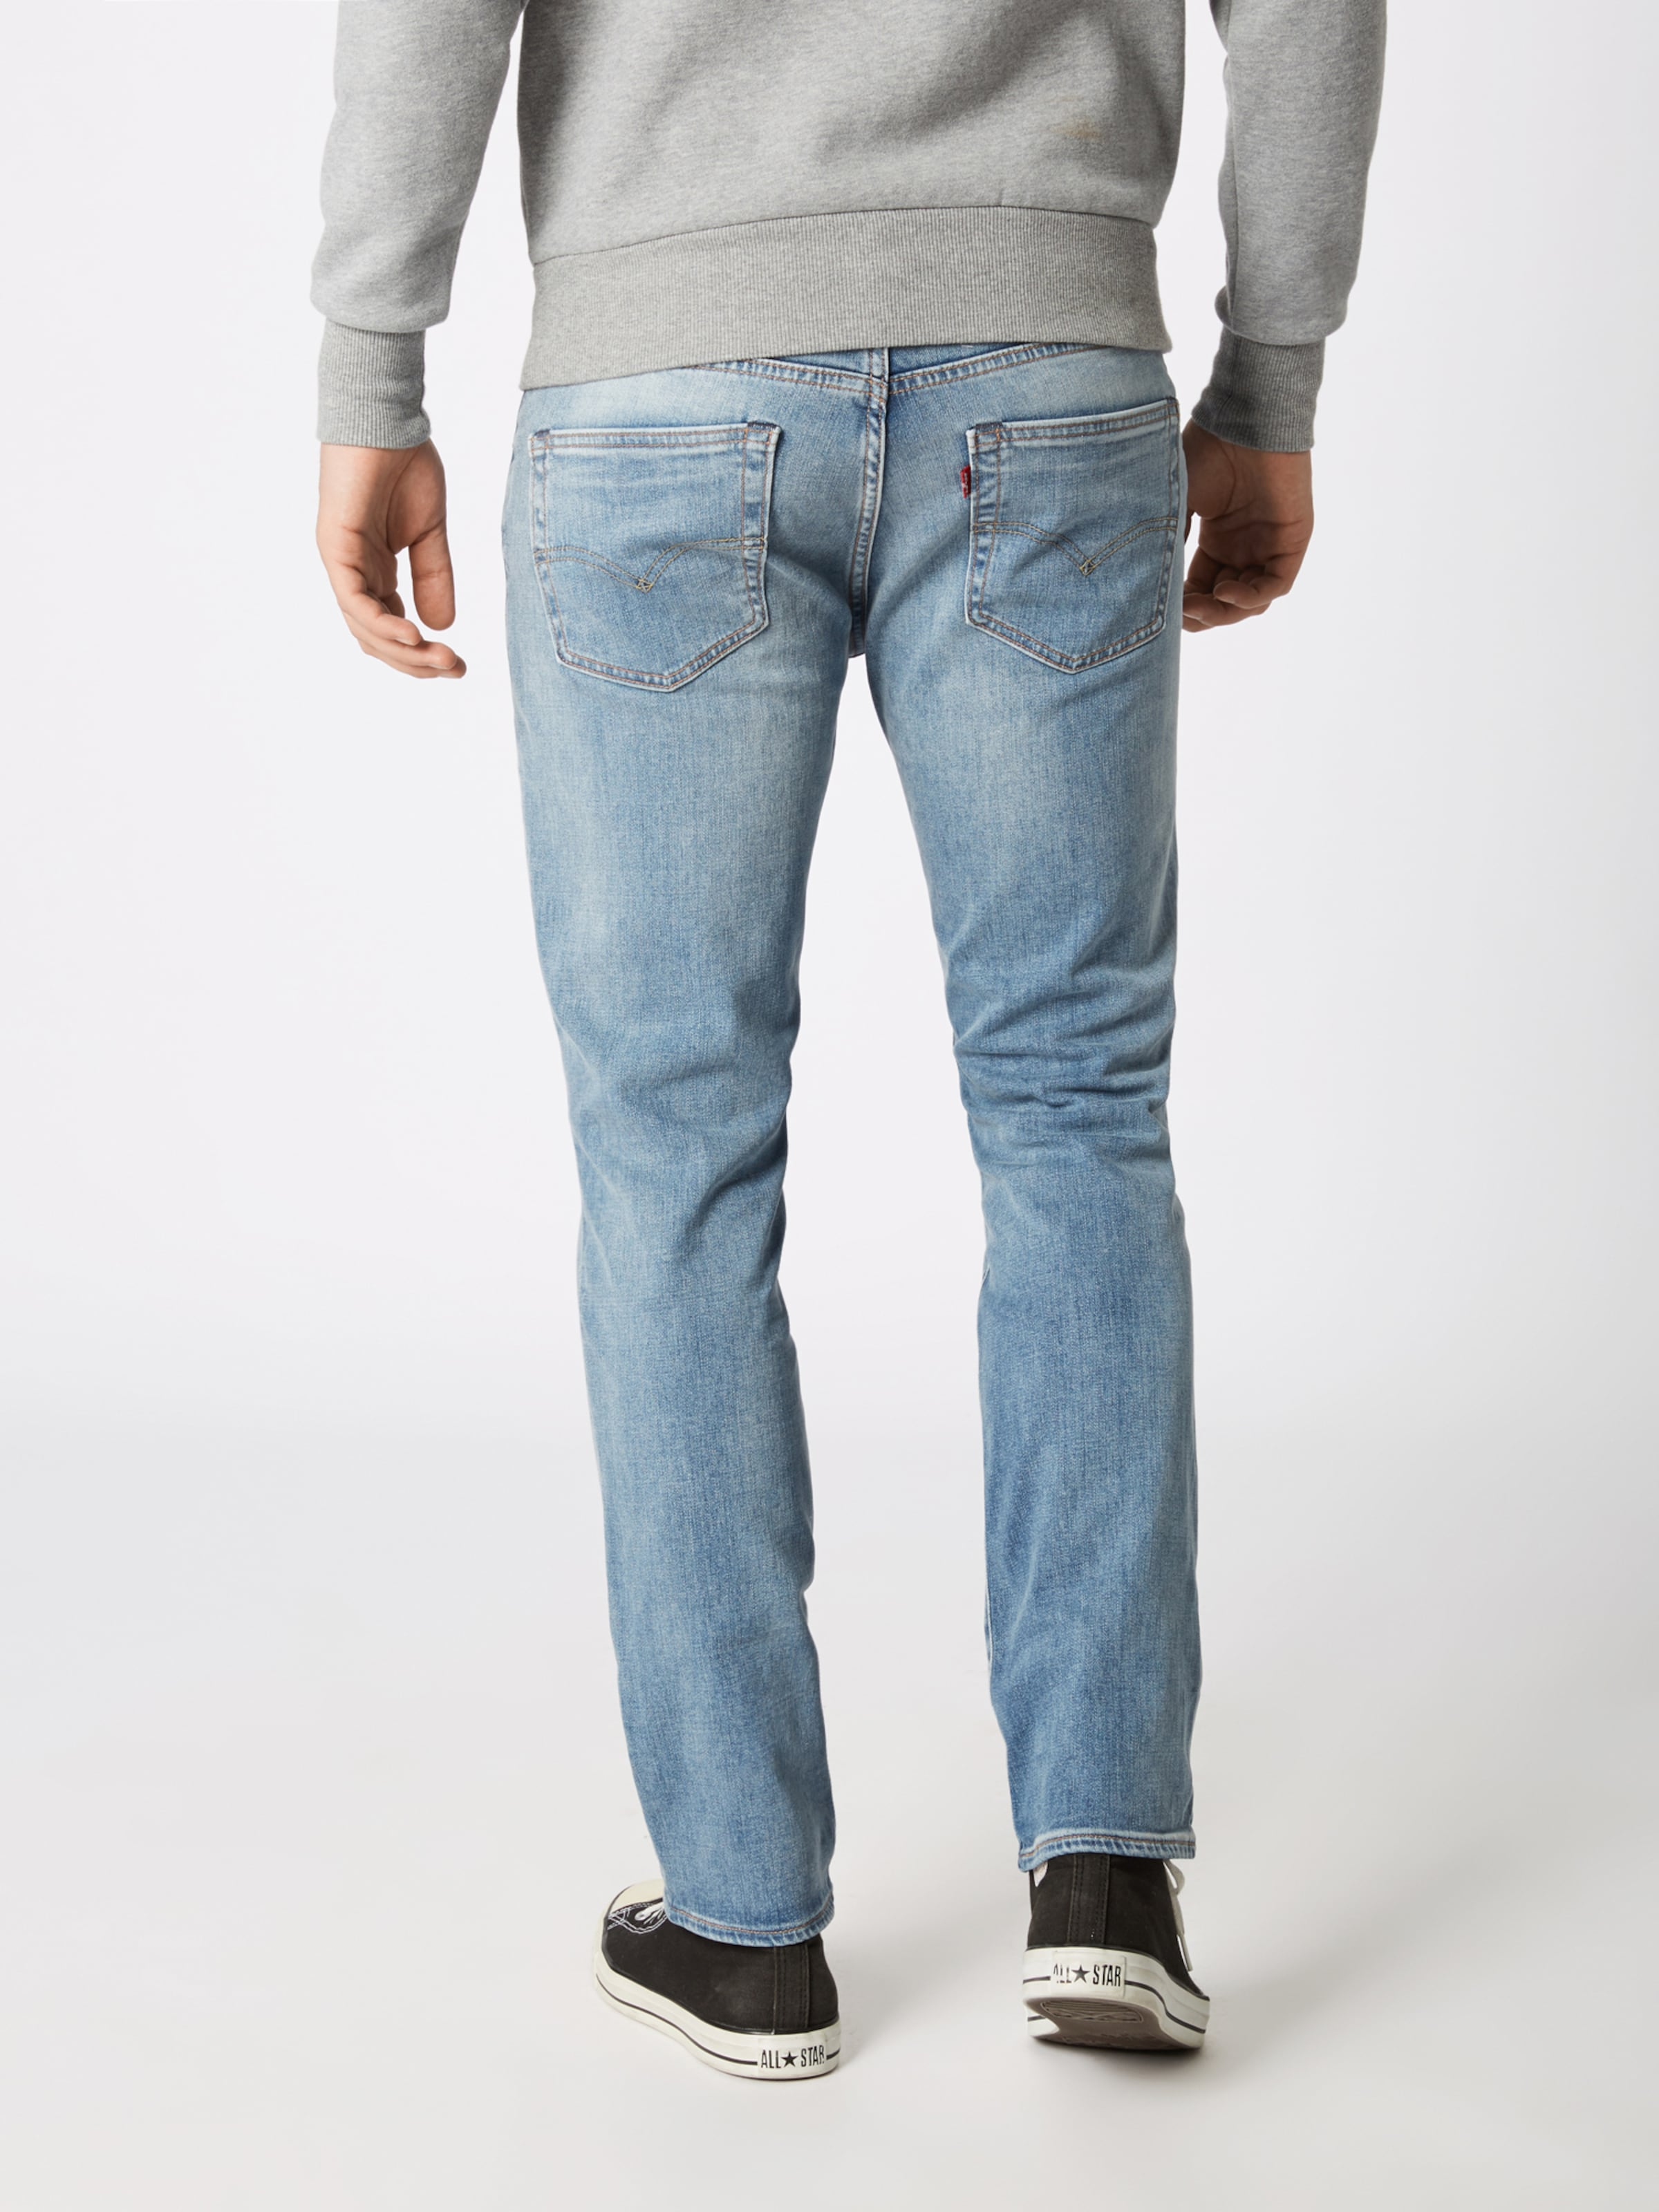 '511' Blauw In Levi's Denim Jeans JlF1KcT